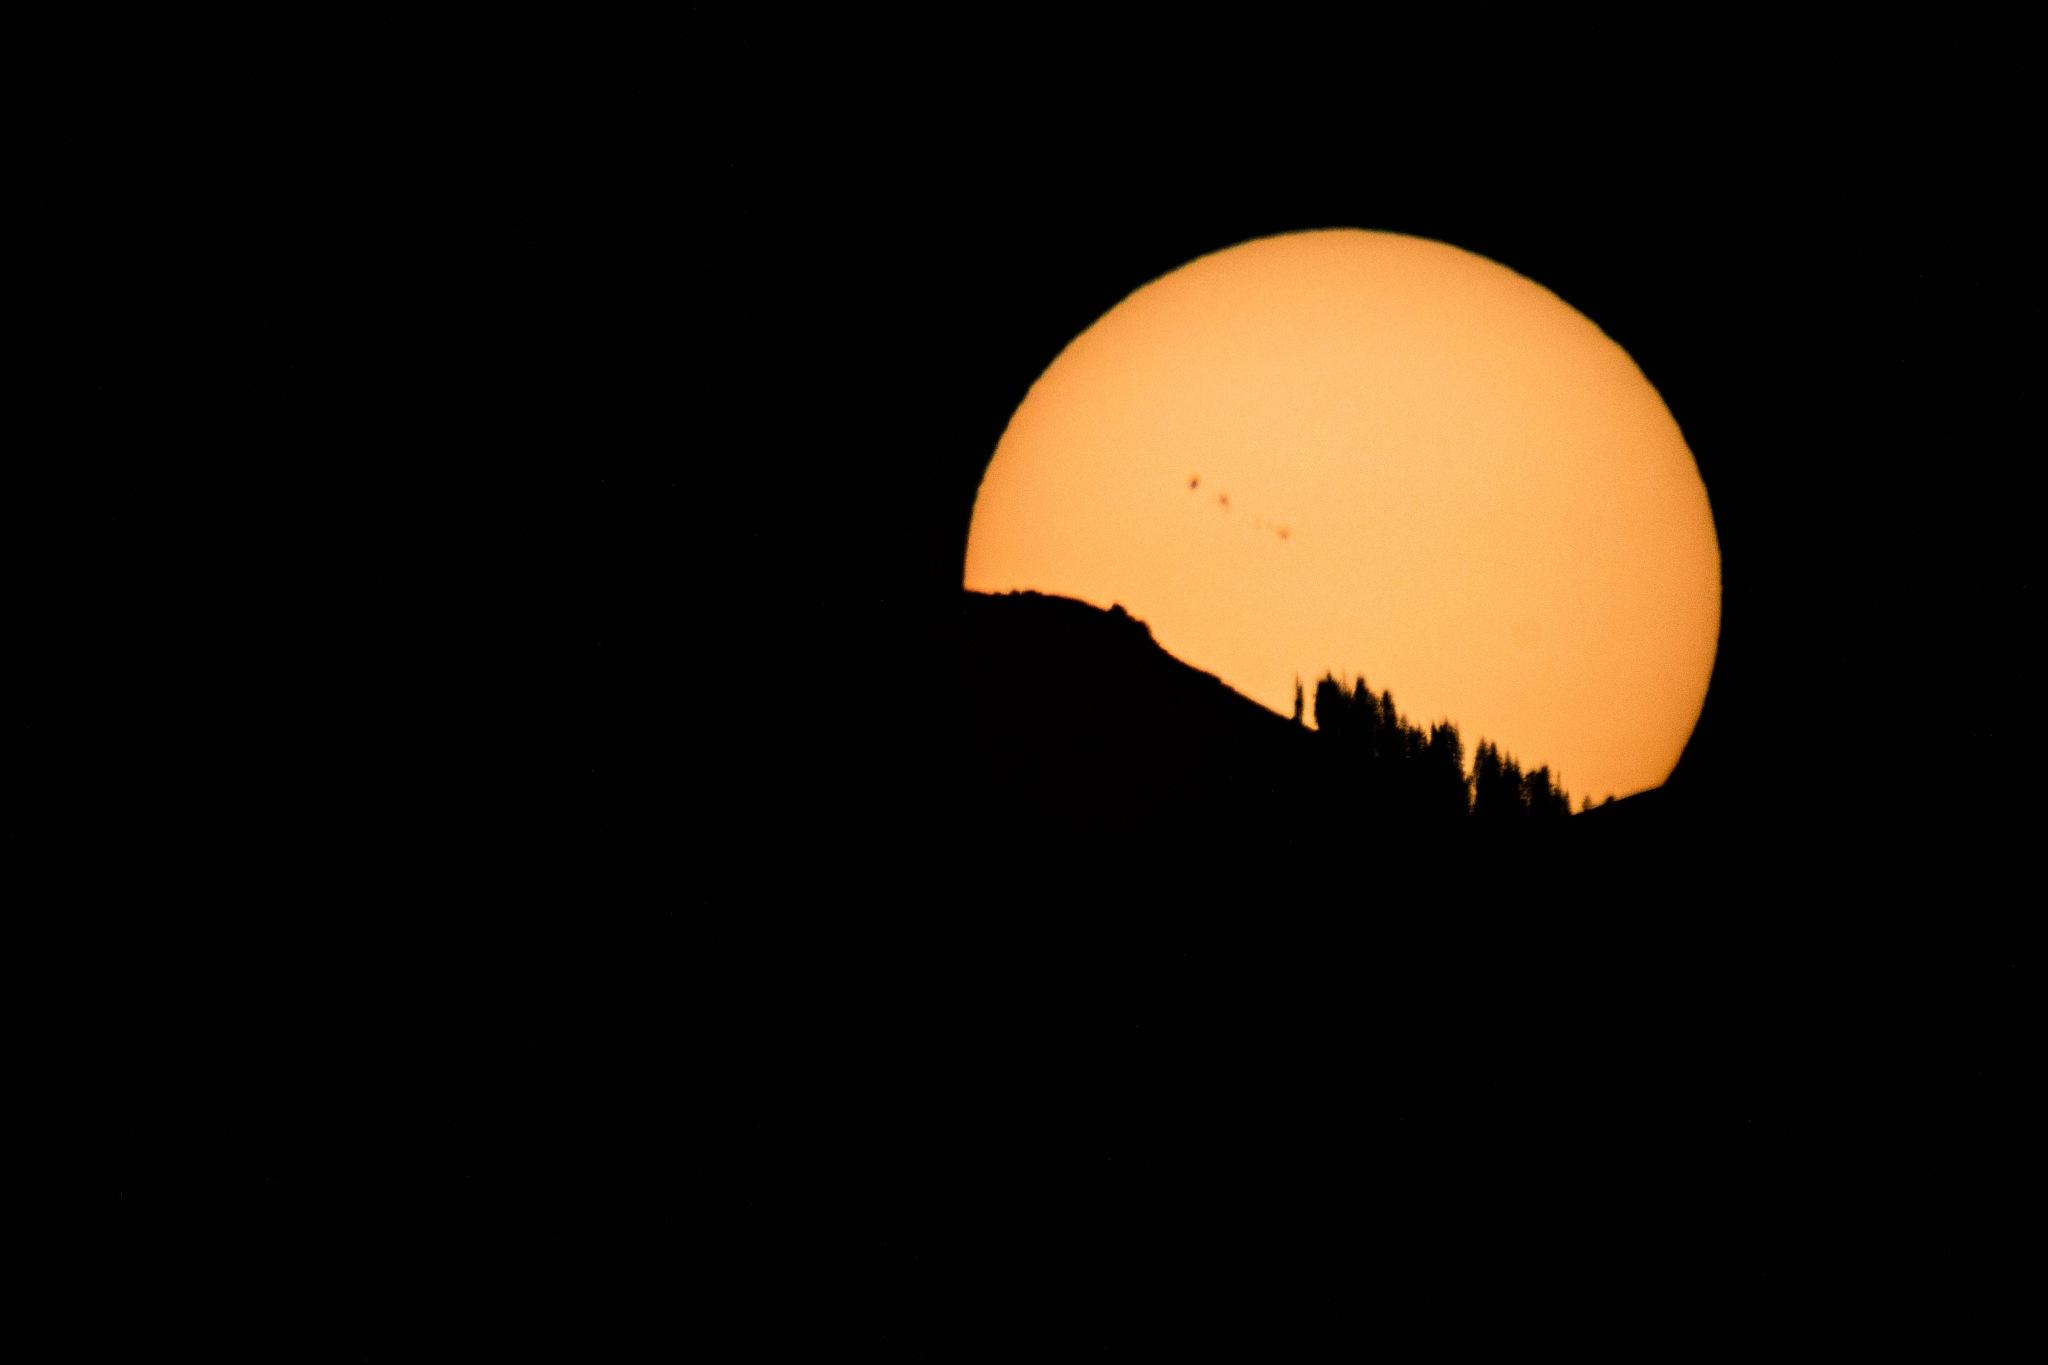 Sun Setting like a Moonrise by drchad480